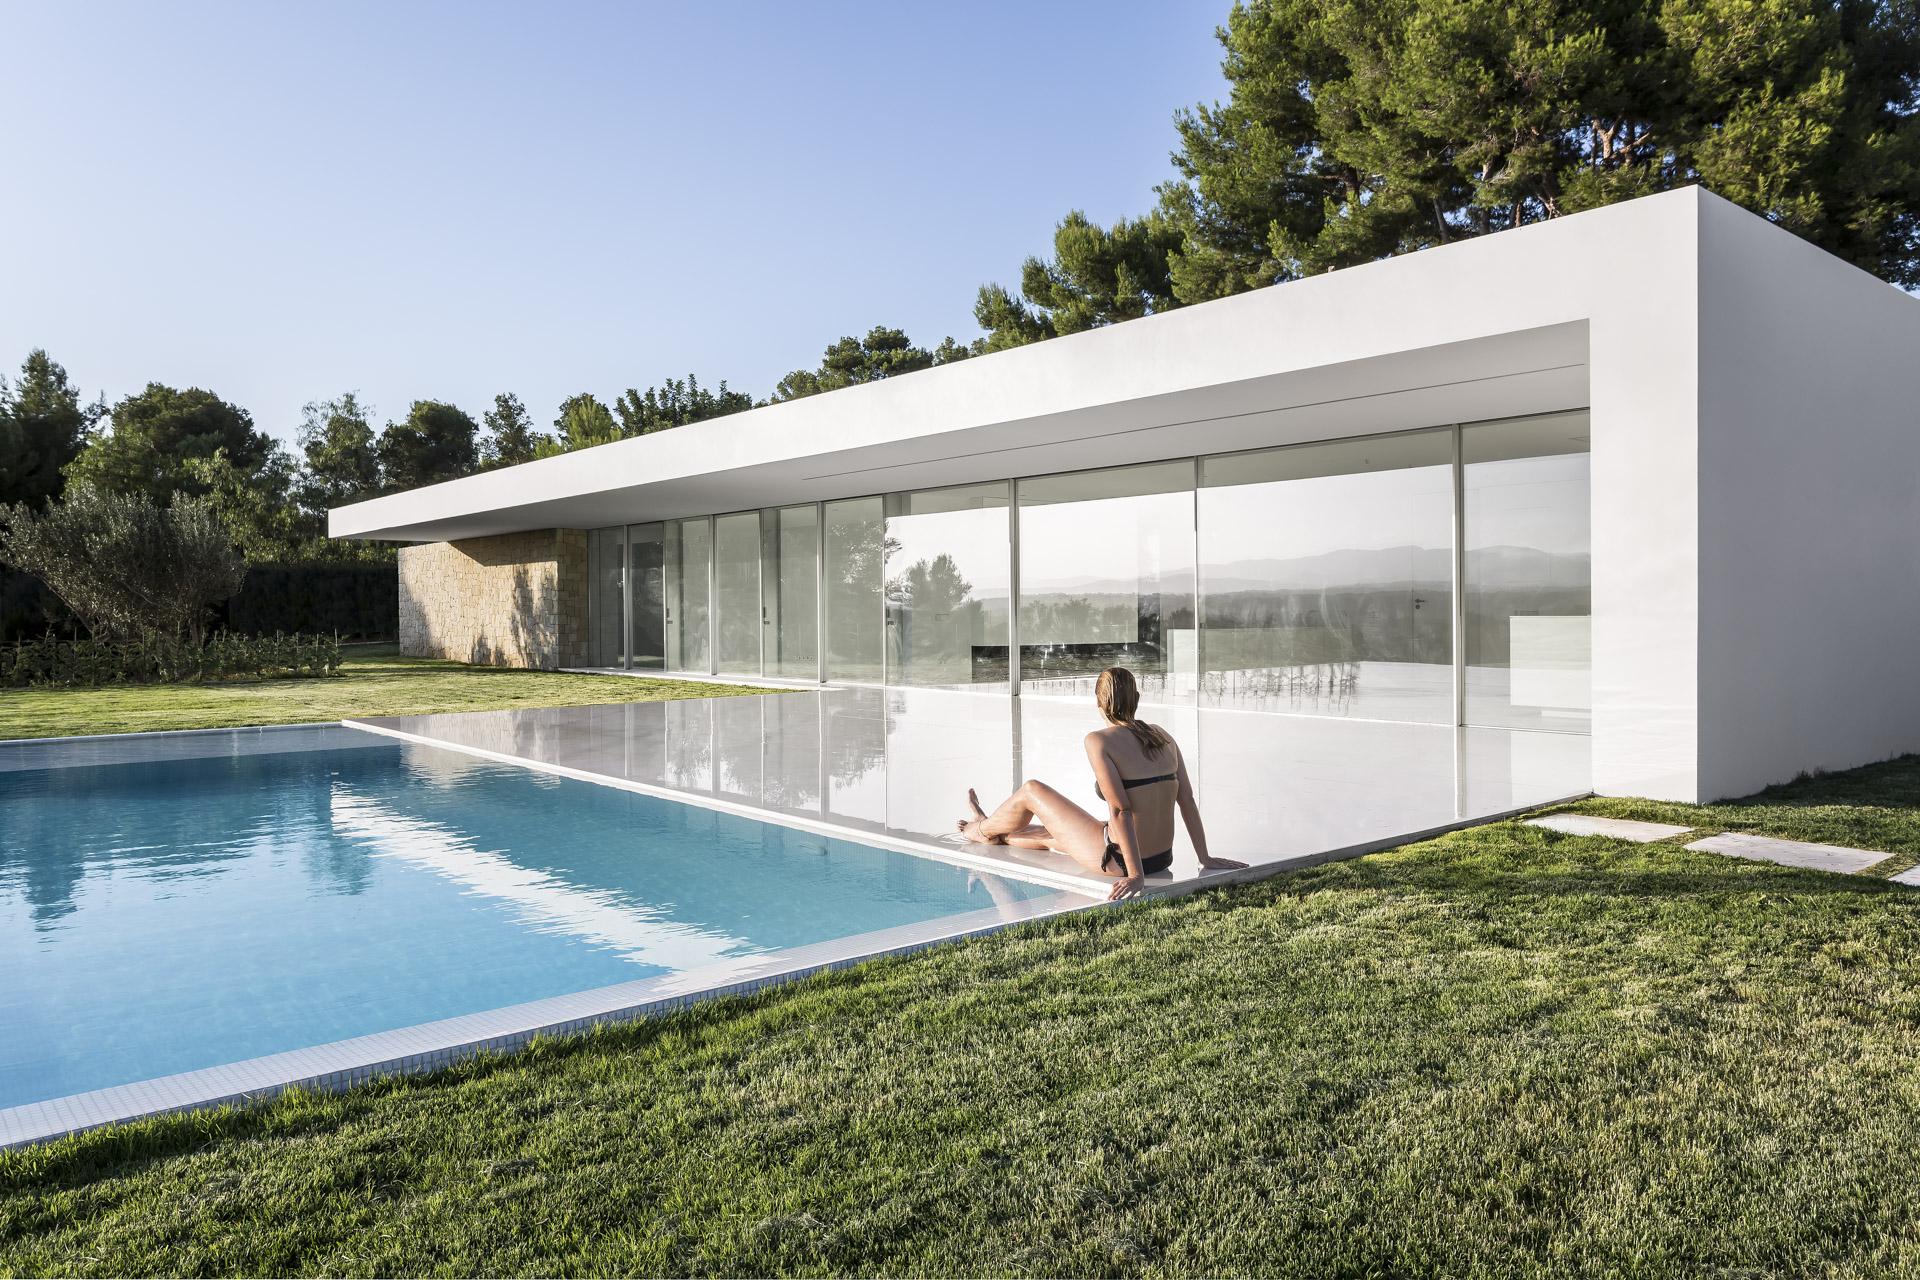 fotografia-arquitectura-valencia-german-cabo-gallardo-llopis-villamarchante-vivienda-41